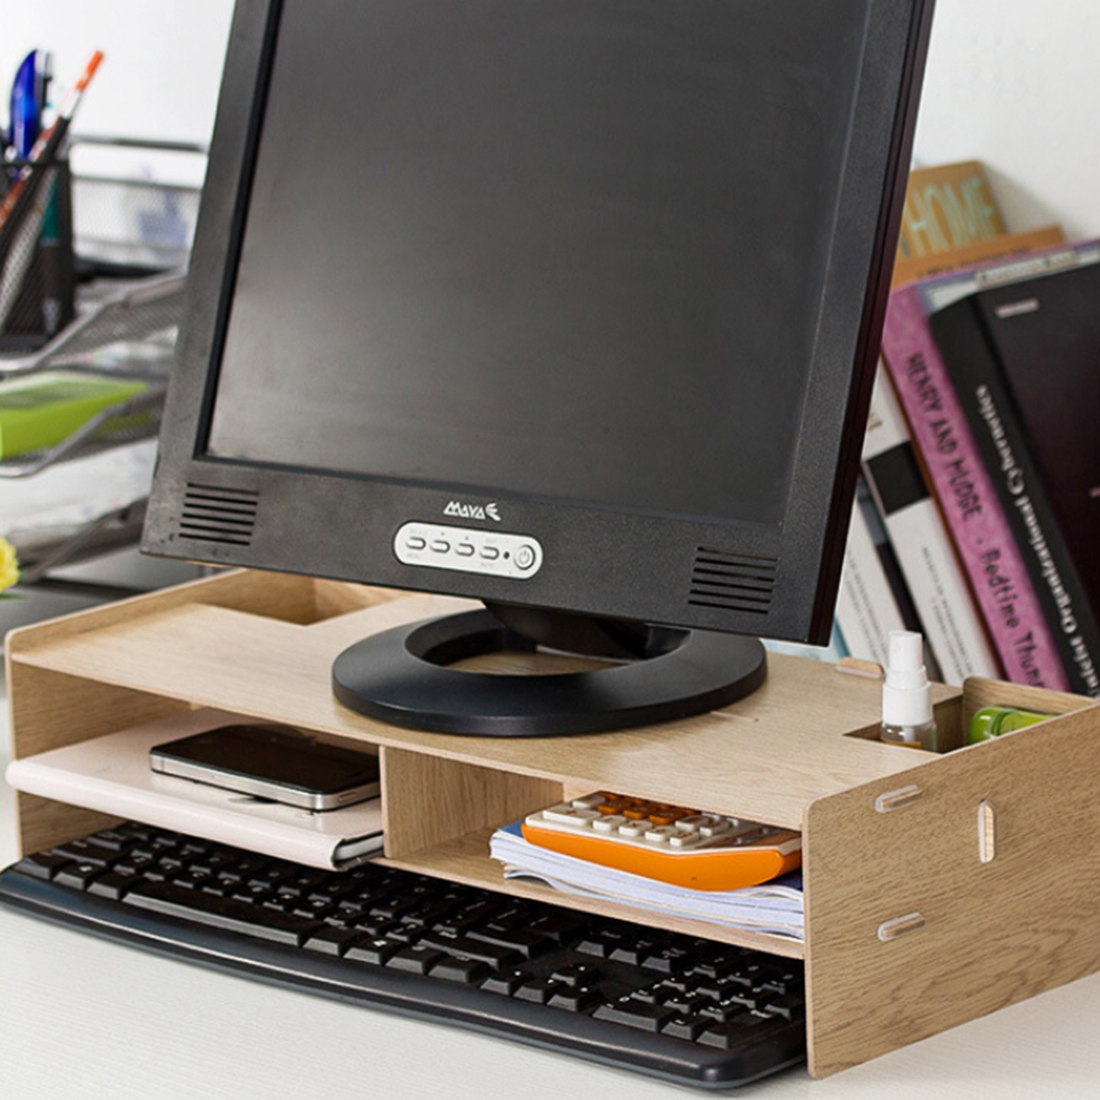 Cheap desktop computer - Hipsteen Diy Desktop Computer Monitor Riser Stand Desktop Wooden Monitor Riser With Storage Slots Storage Holder